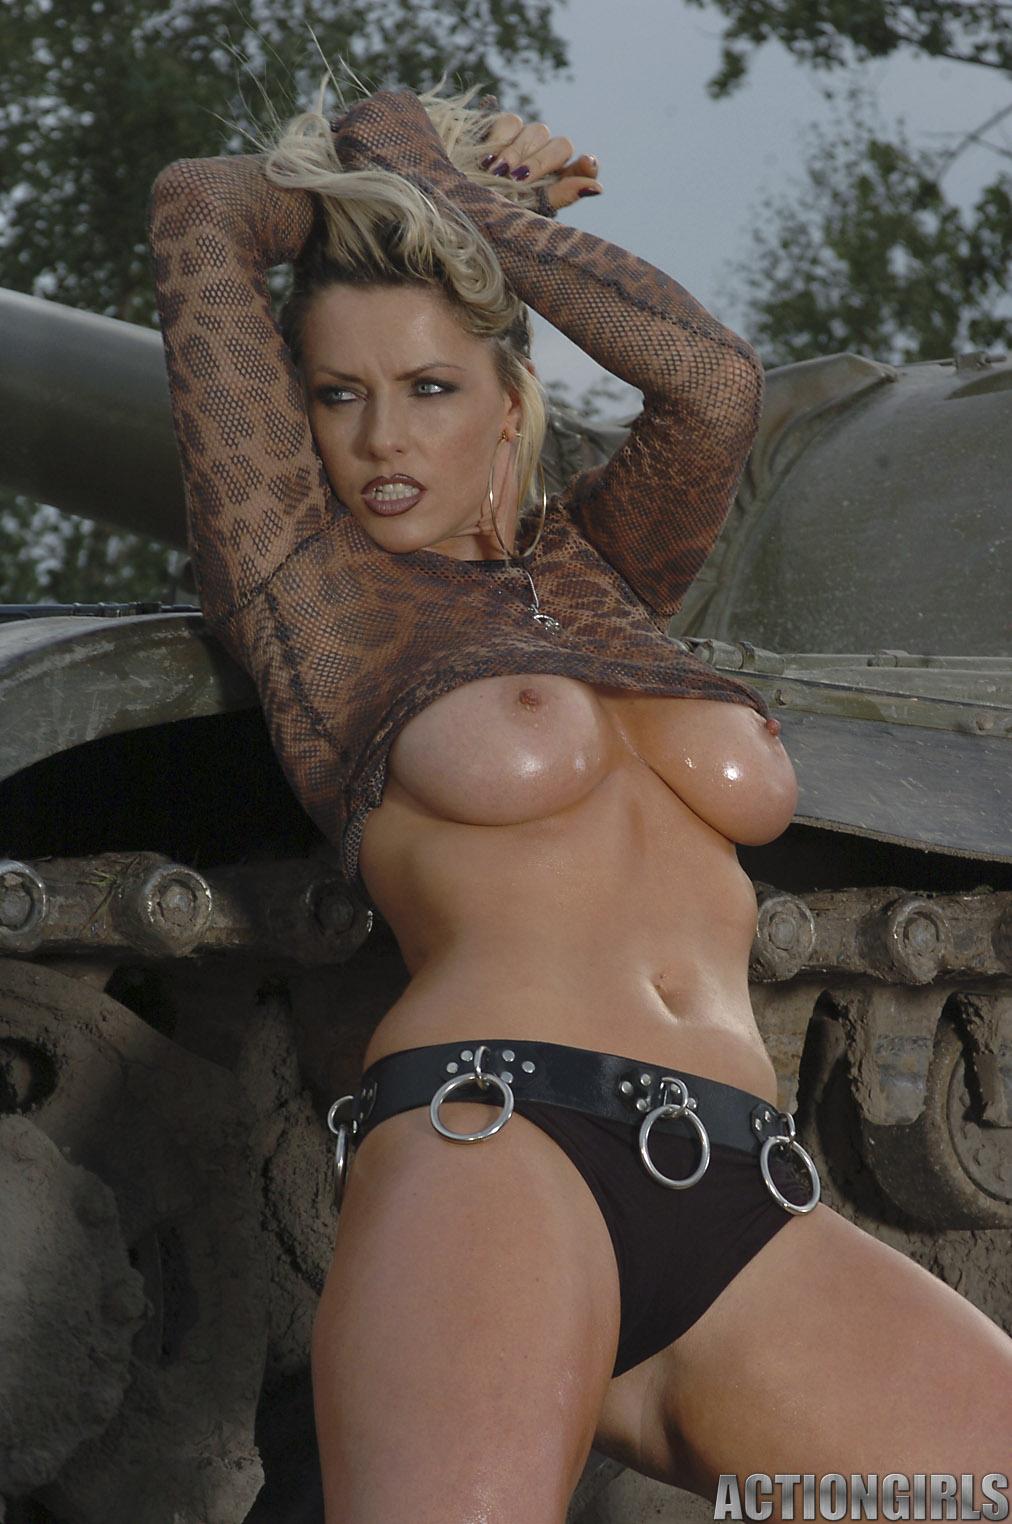 naked women with big guns